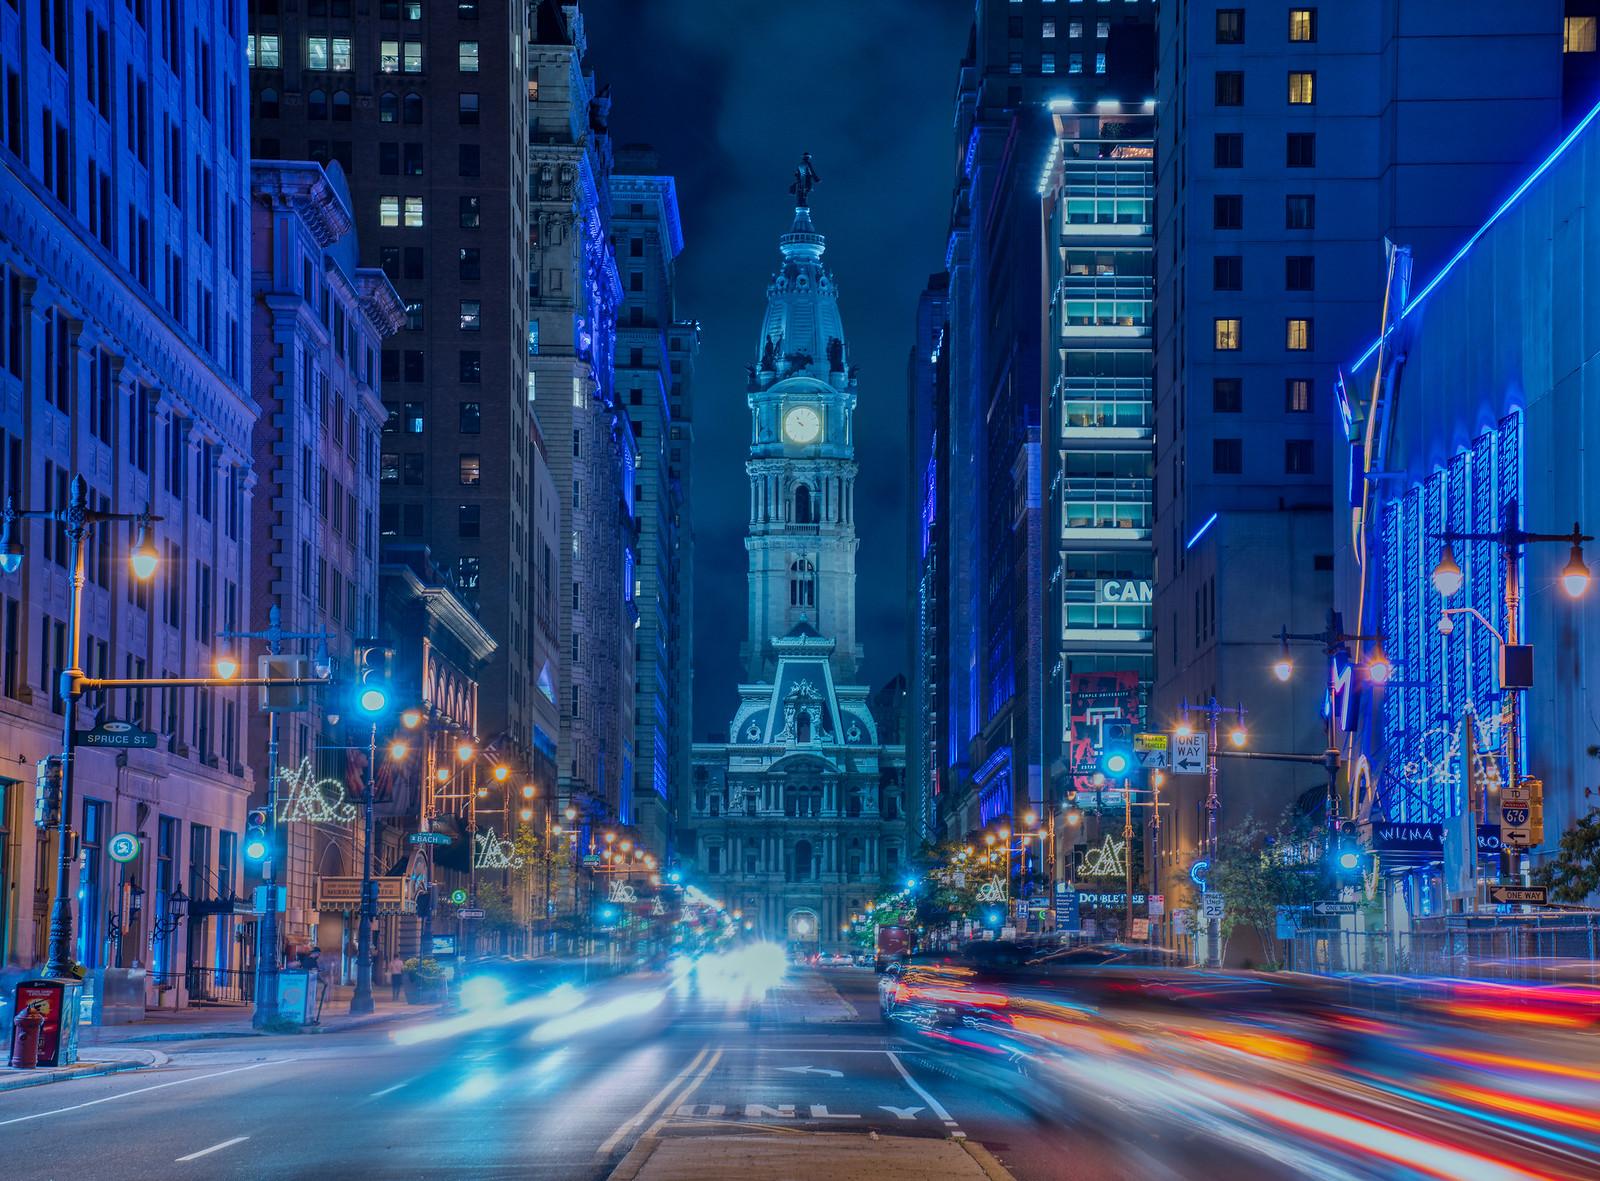 Night View of Philadelphia